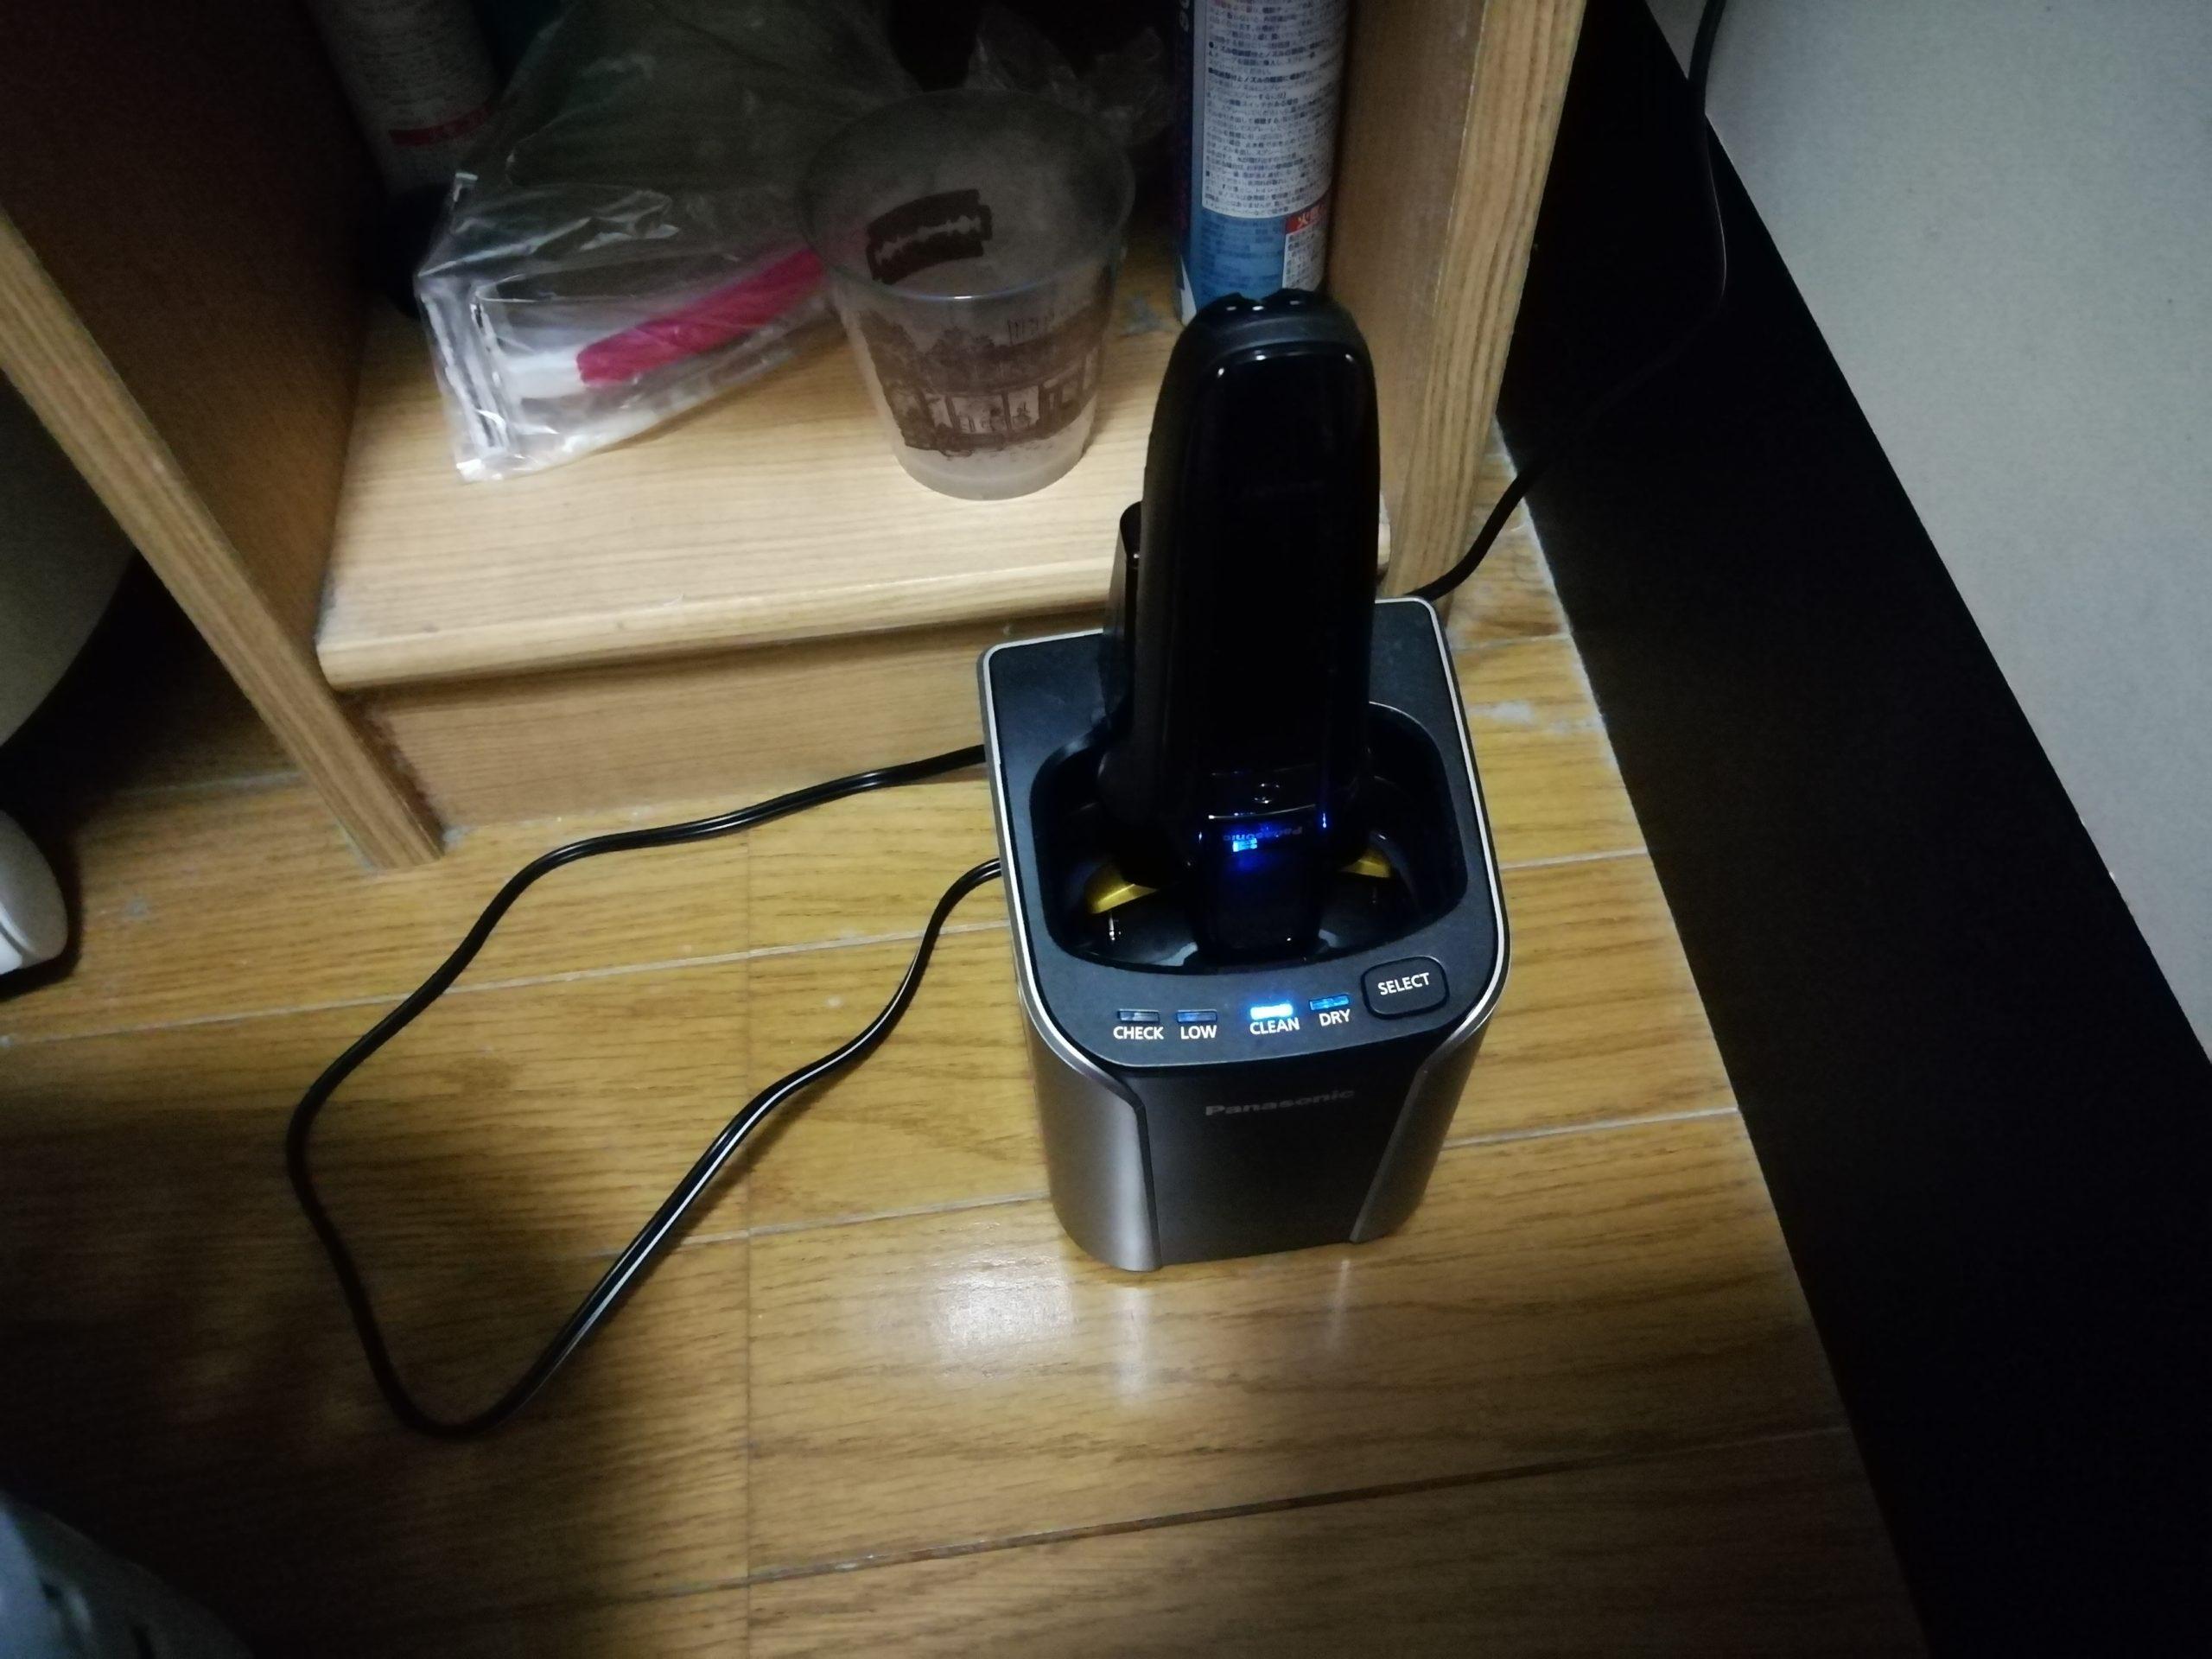 PanasonicのES-ELV7Eを充電・洗浄